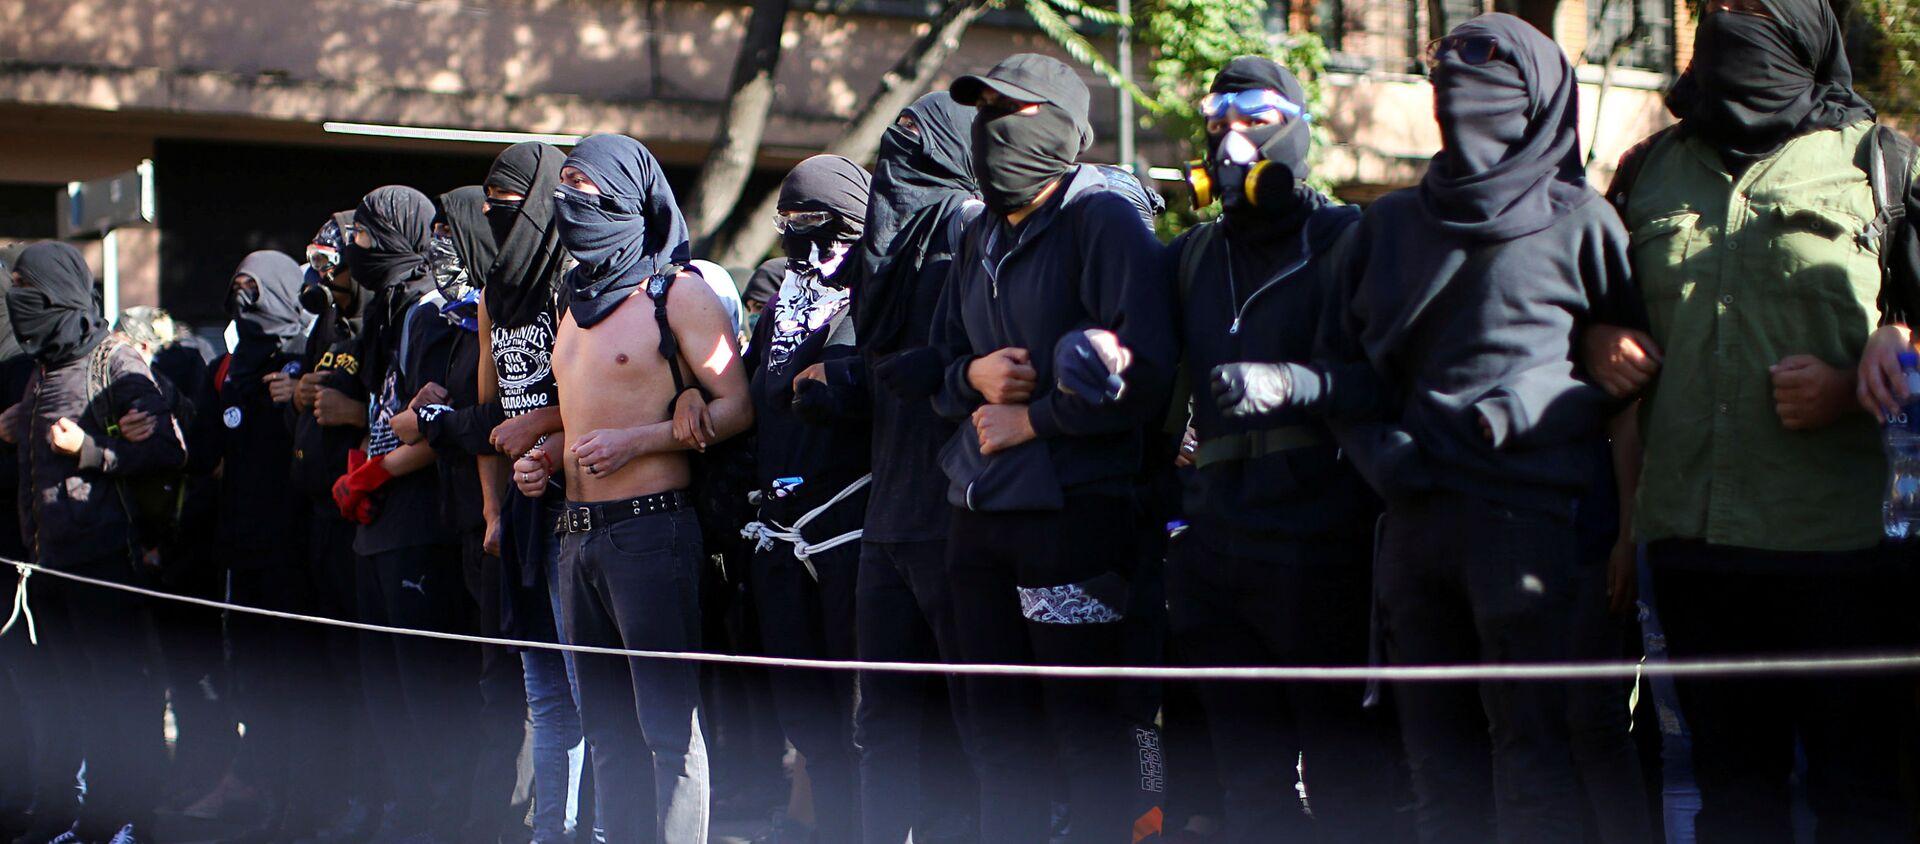 Manifestantes en México - Sputnik Mundo, 1920, 03.10.2020